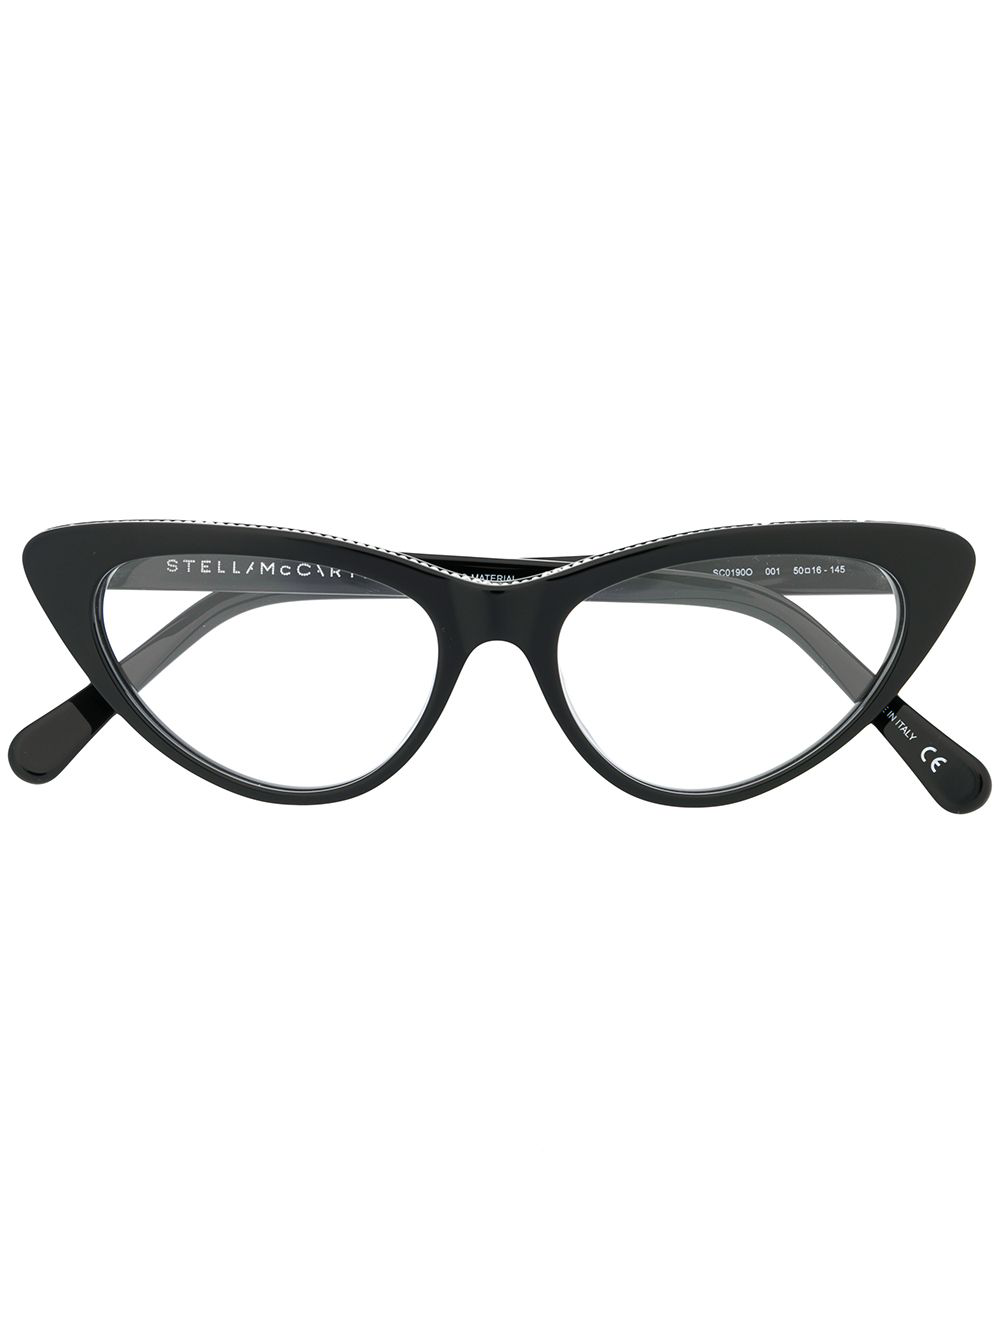 b9f548771a Stella Mccartney Eyewear Cat Eye Frame Glasses - Black